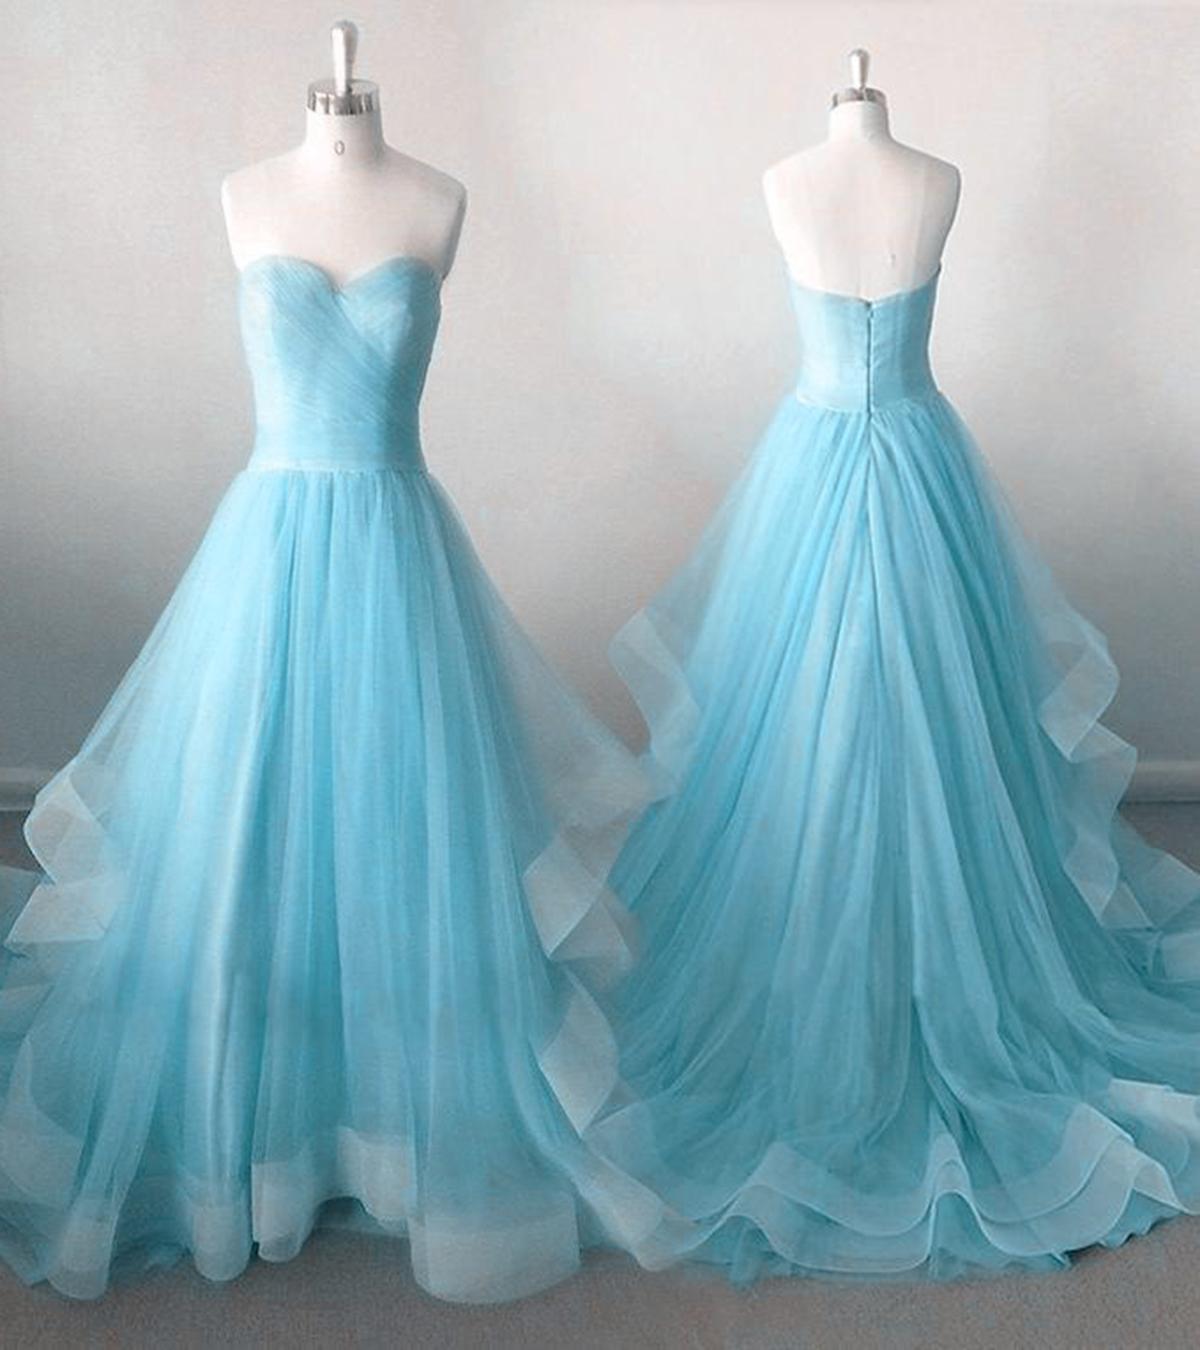 Strapless ice blue tulle sweetheart neckline long prom dress, long ...